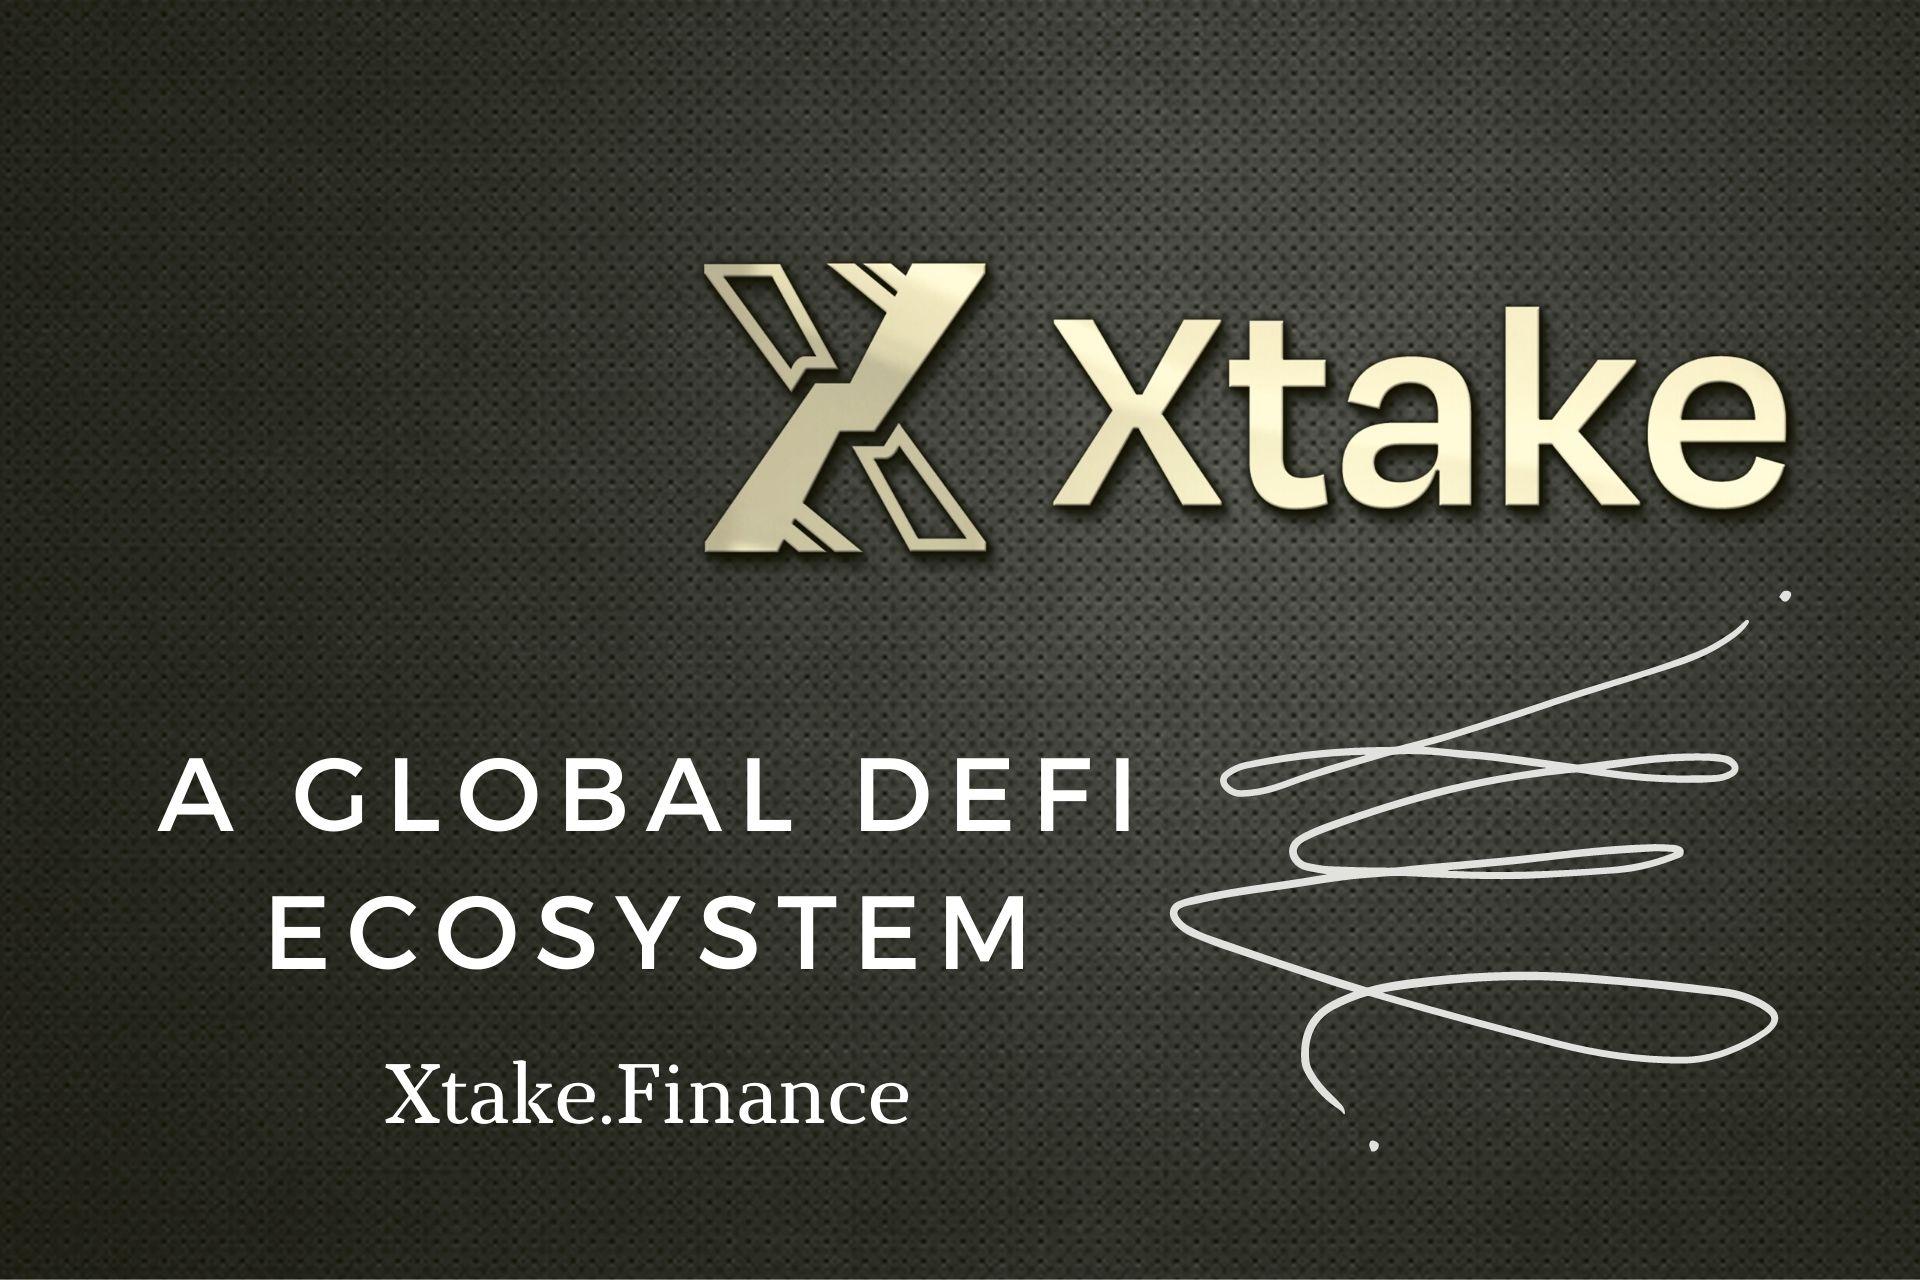 Xtake.Finance